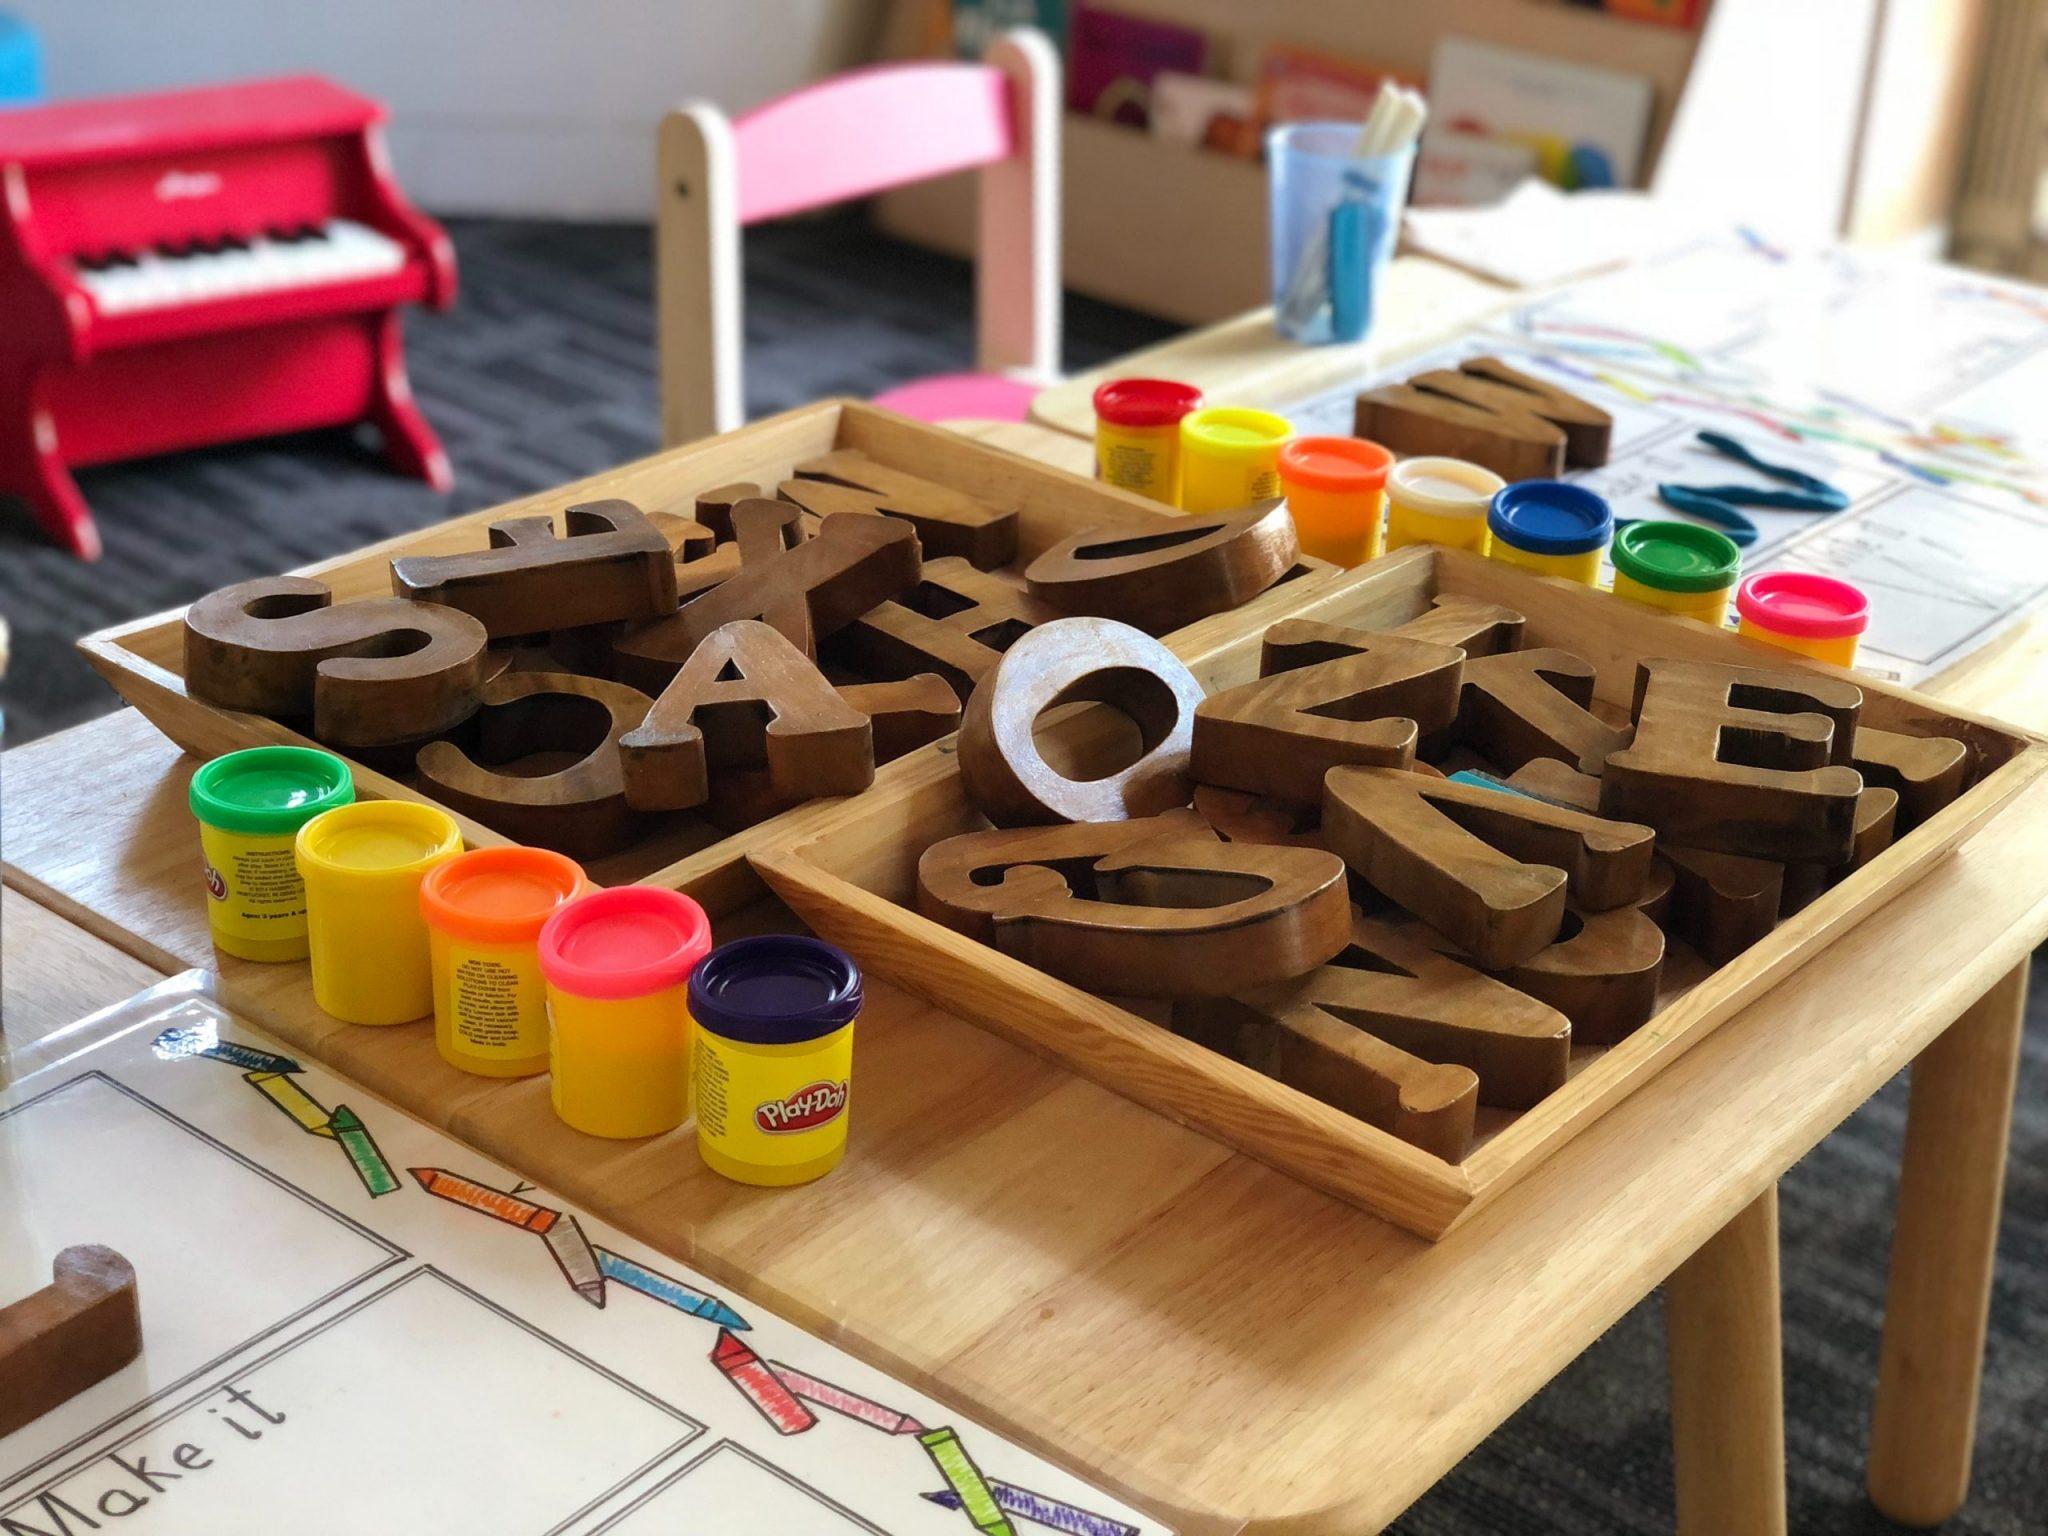 A photo of pre-school supplies